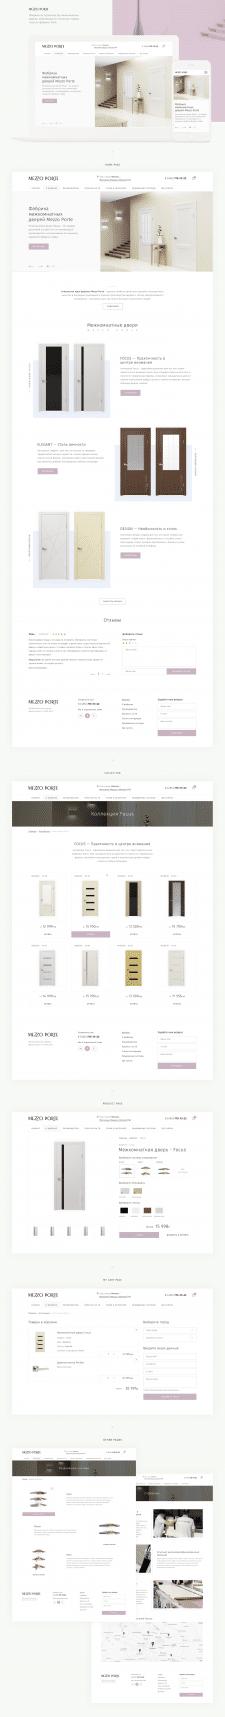 Mezzo Porte - Фабрика межкомнатных дверей